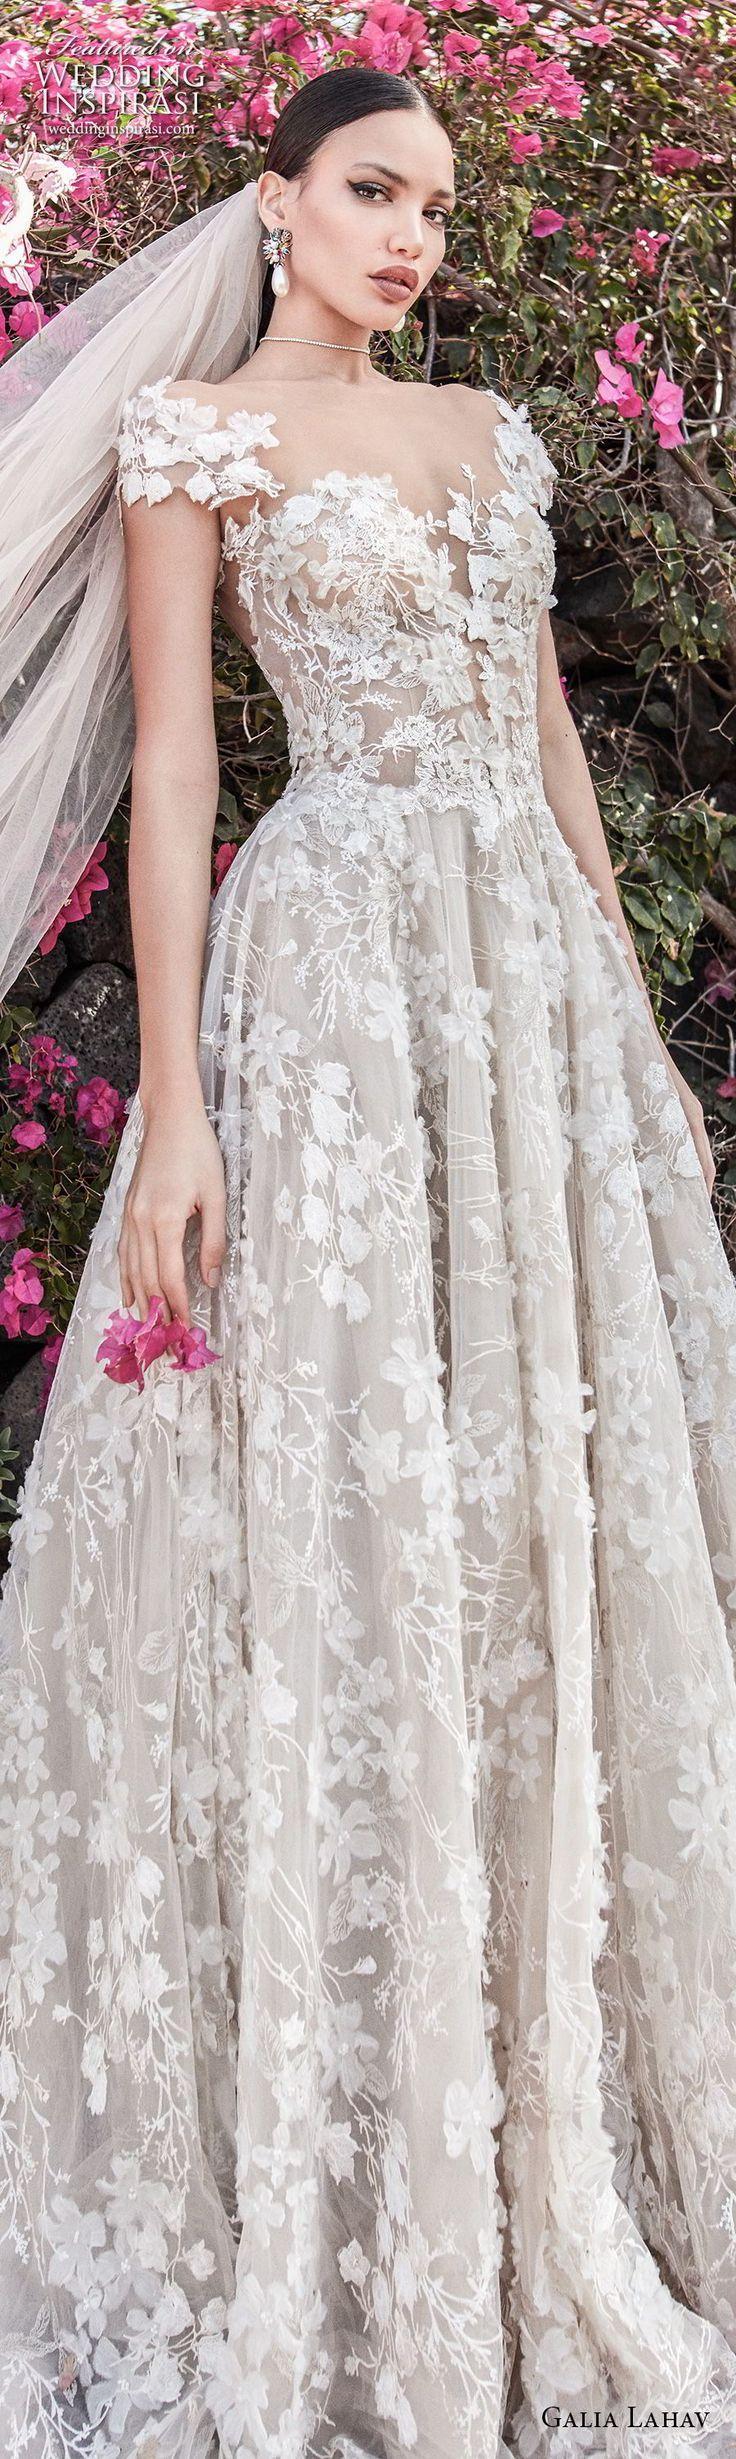 galia lahav couture fall 2018 bridal cap sleeves sweetheart neckline full embellishment elegant romantic a line wedding dress open back chapel train (1) lv -- Galia Lahav Couture Fall 2018 Wedding Dresses #wedding #weddings #bridal